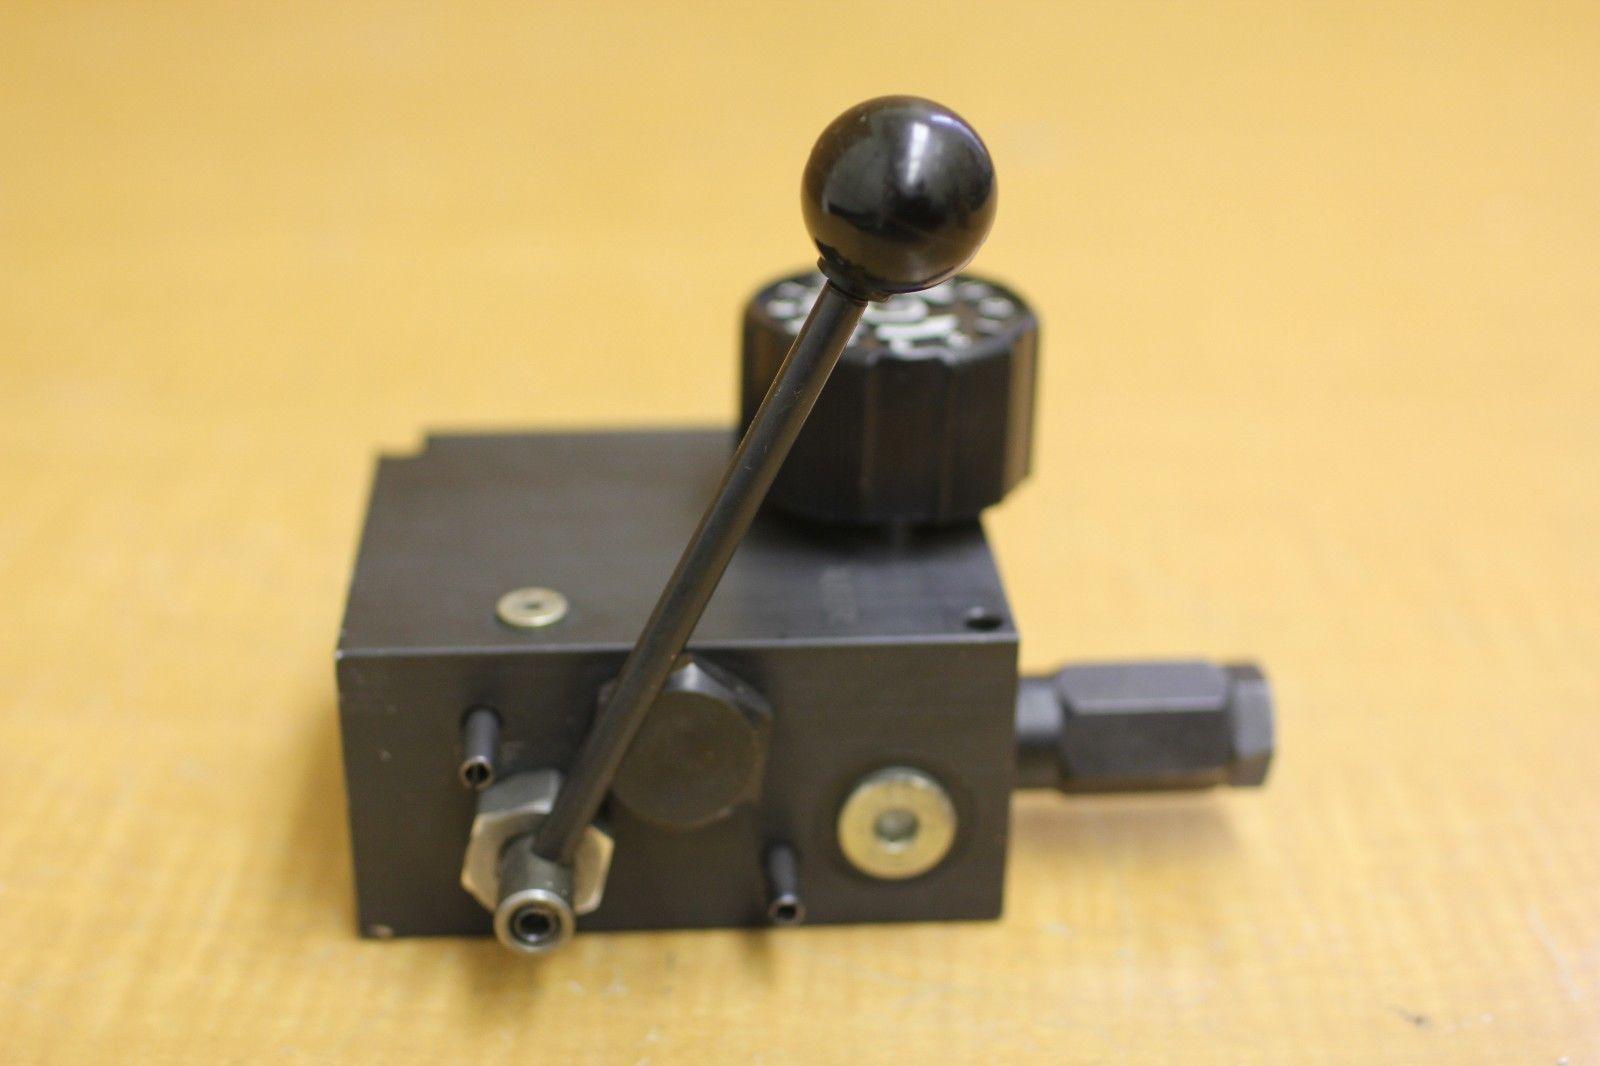 Hyd Control Valve Lever Knobs : New parker gresen single knob hyd auger flow control valve